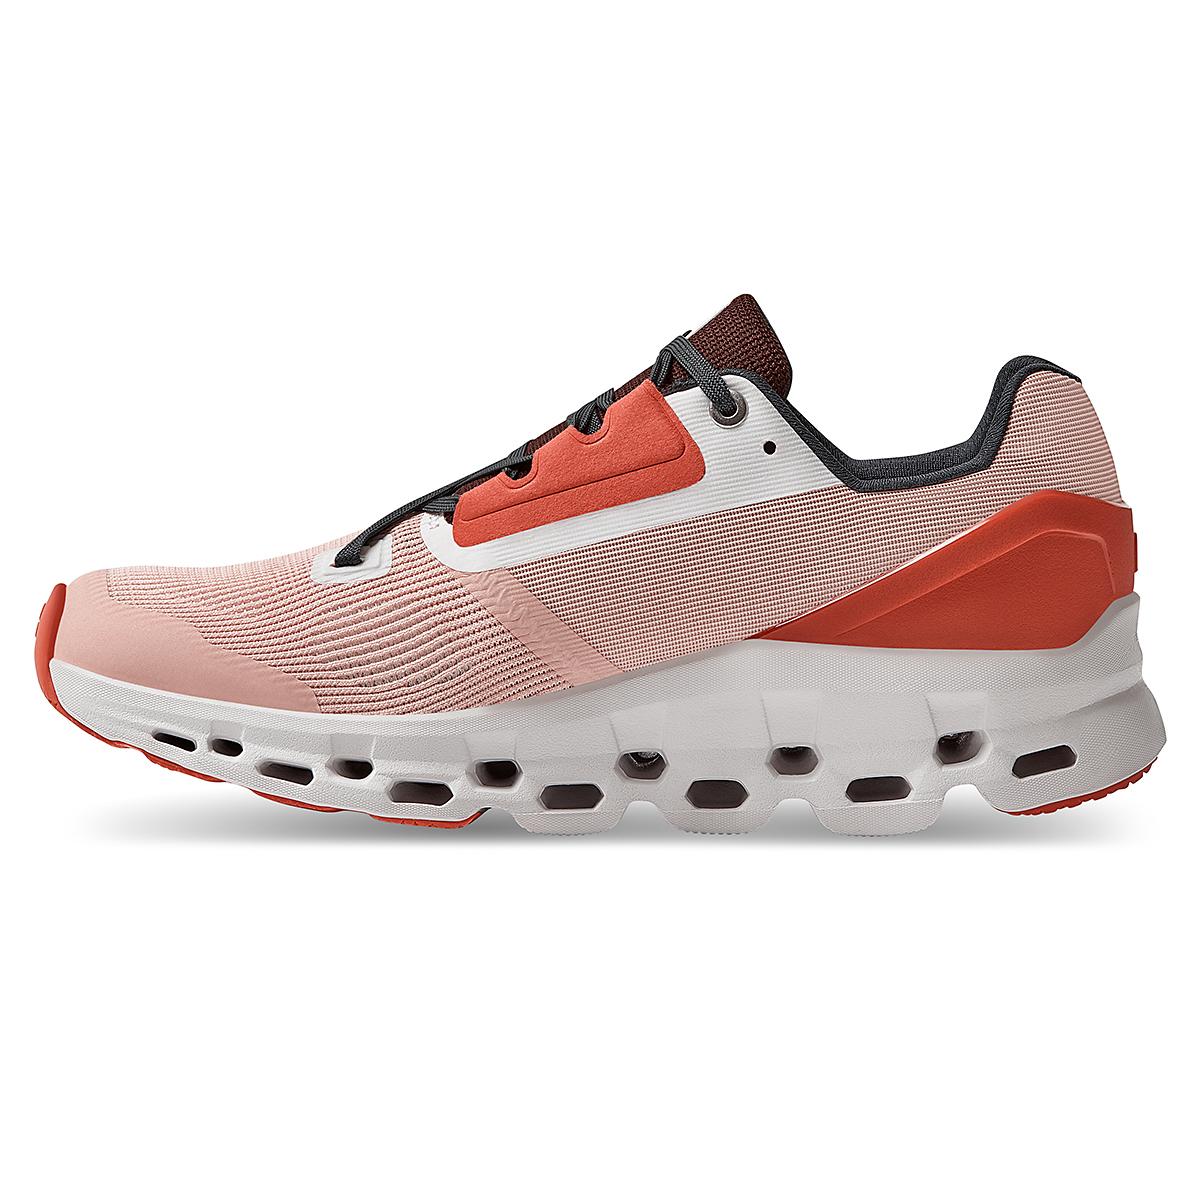 Women's On Cloudstratus 2.0 Running Shoe - Color: Rose/Red - Size: 5 - Width: Regular, Rose/Red, large, image 3